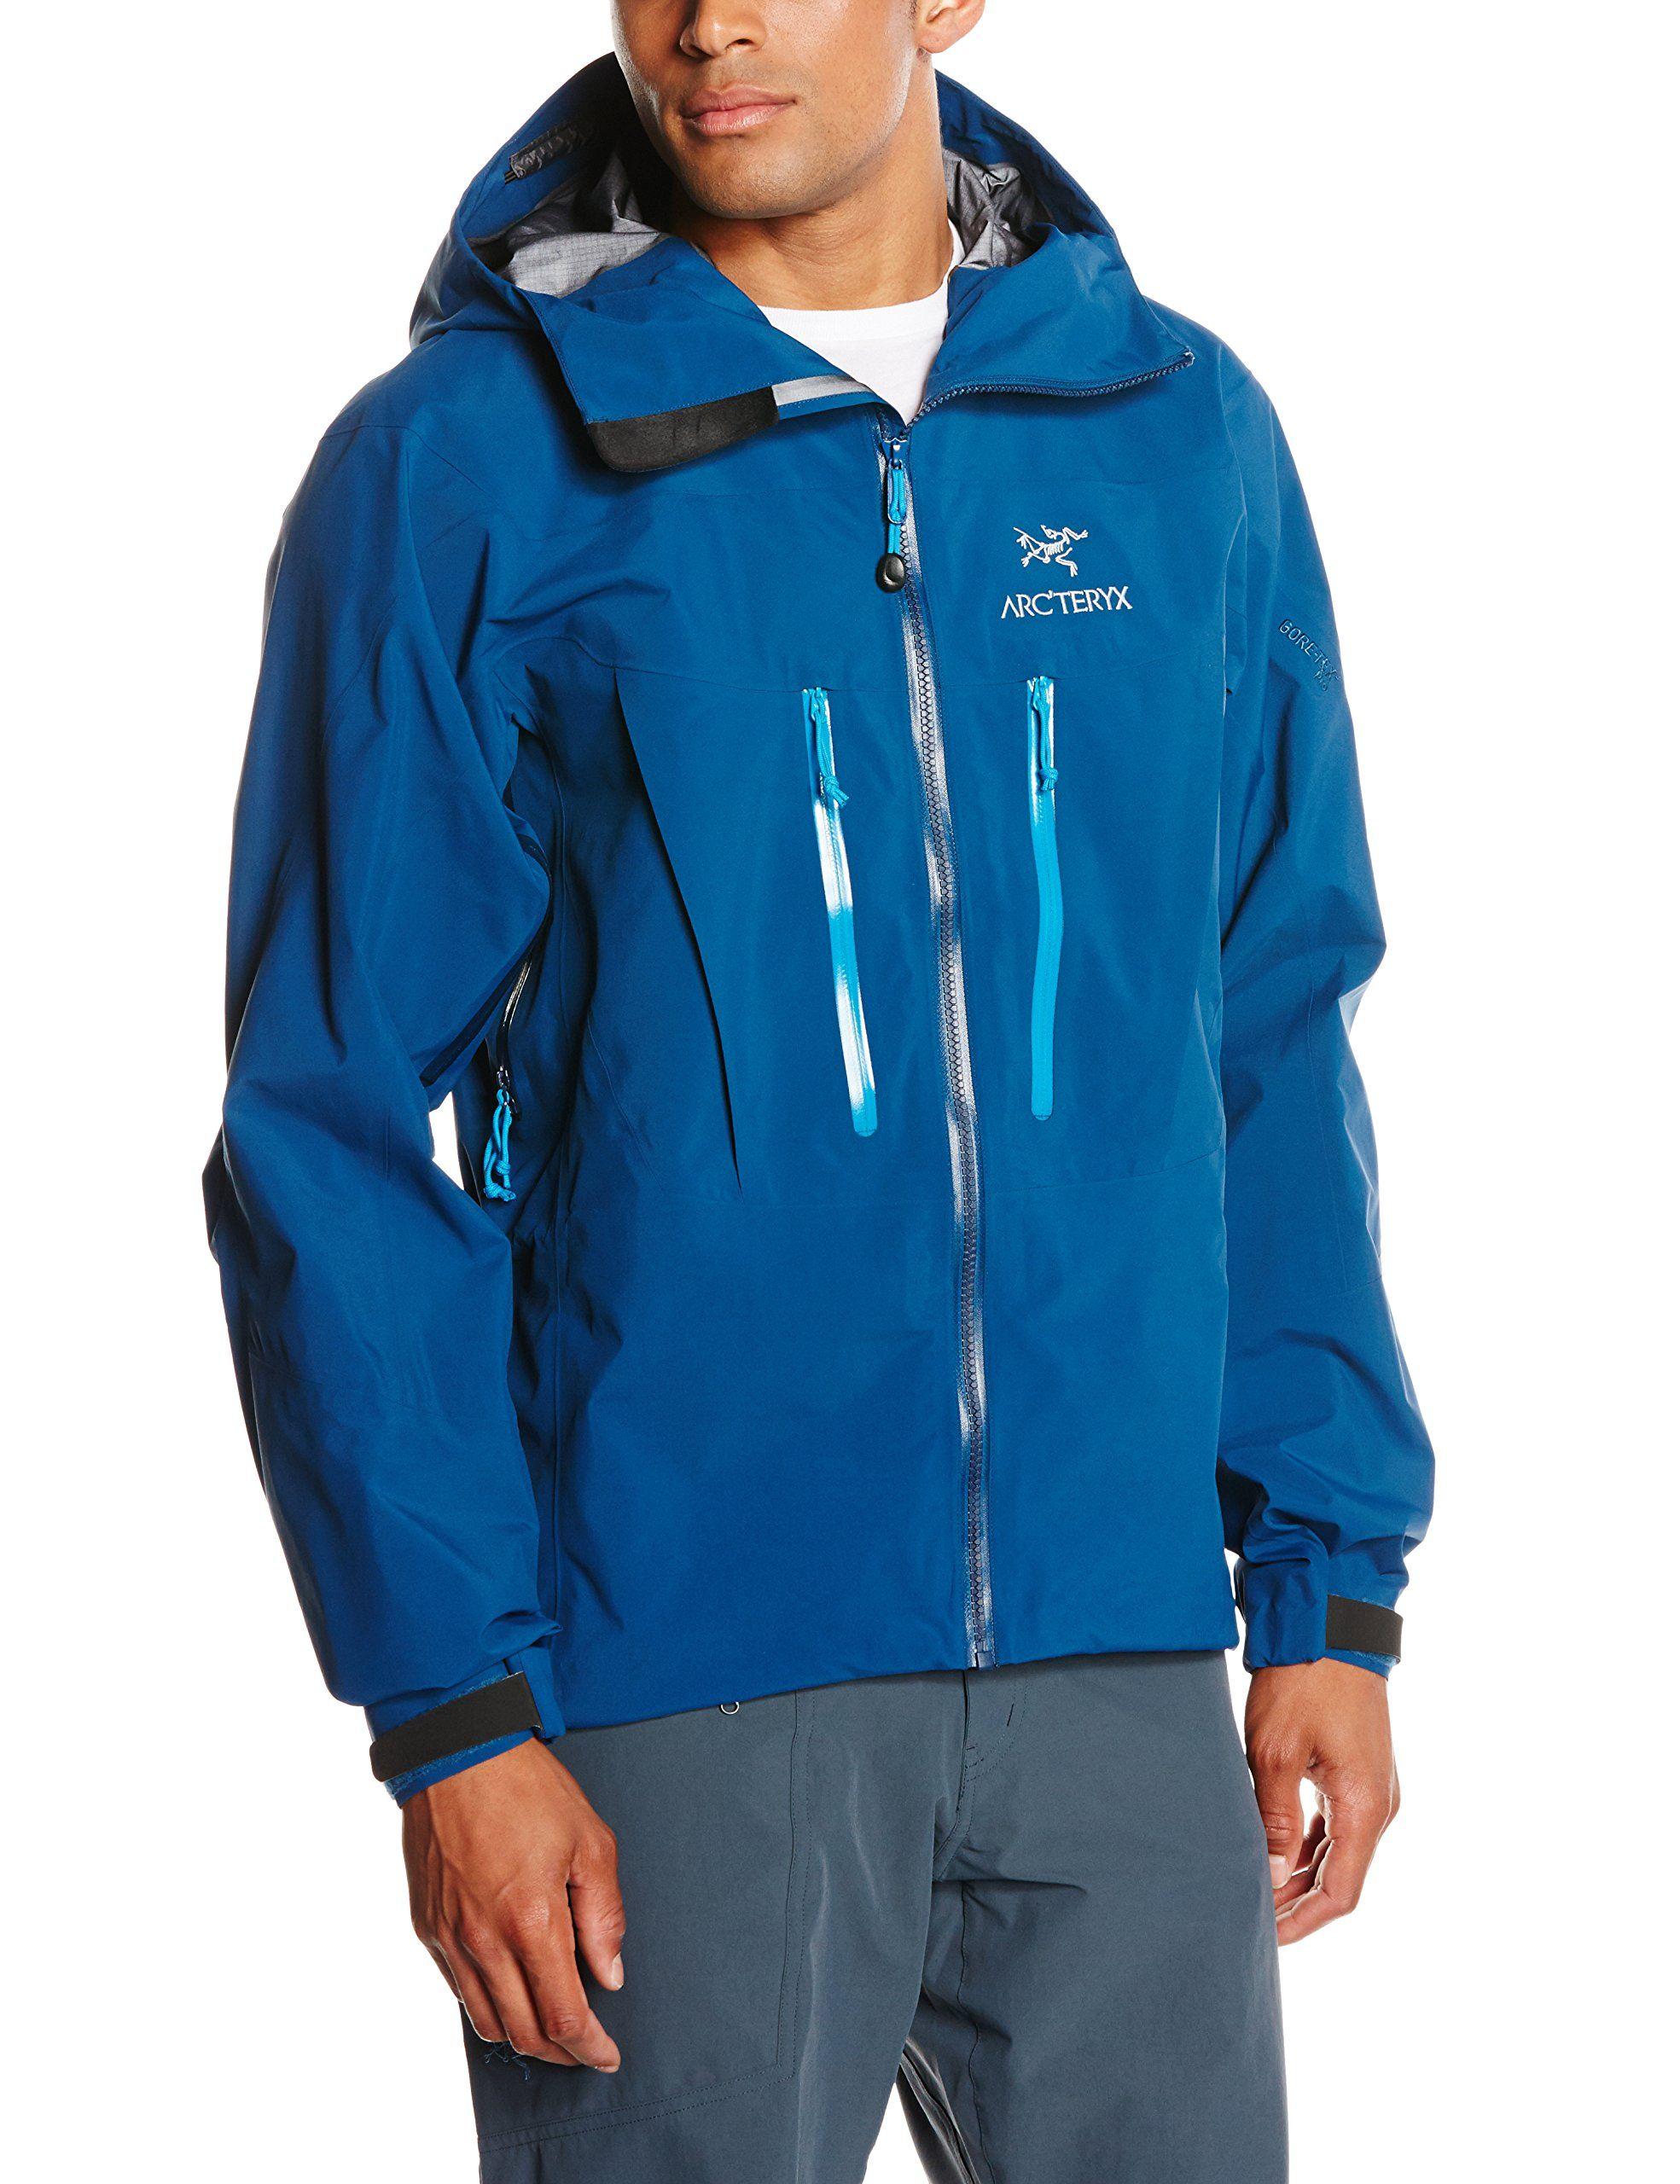 Arcteryx Alpha SV Jacket Mens Poseidon Small Be sure to